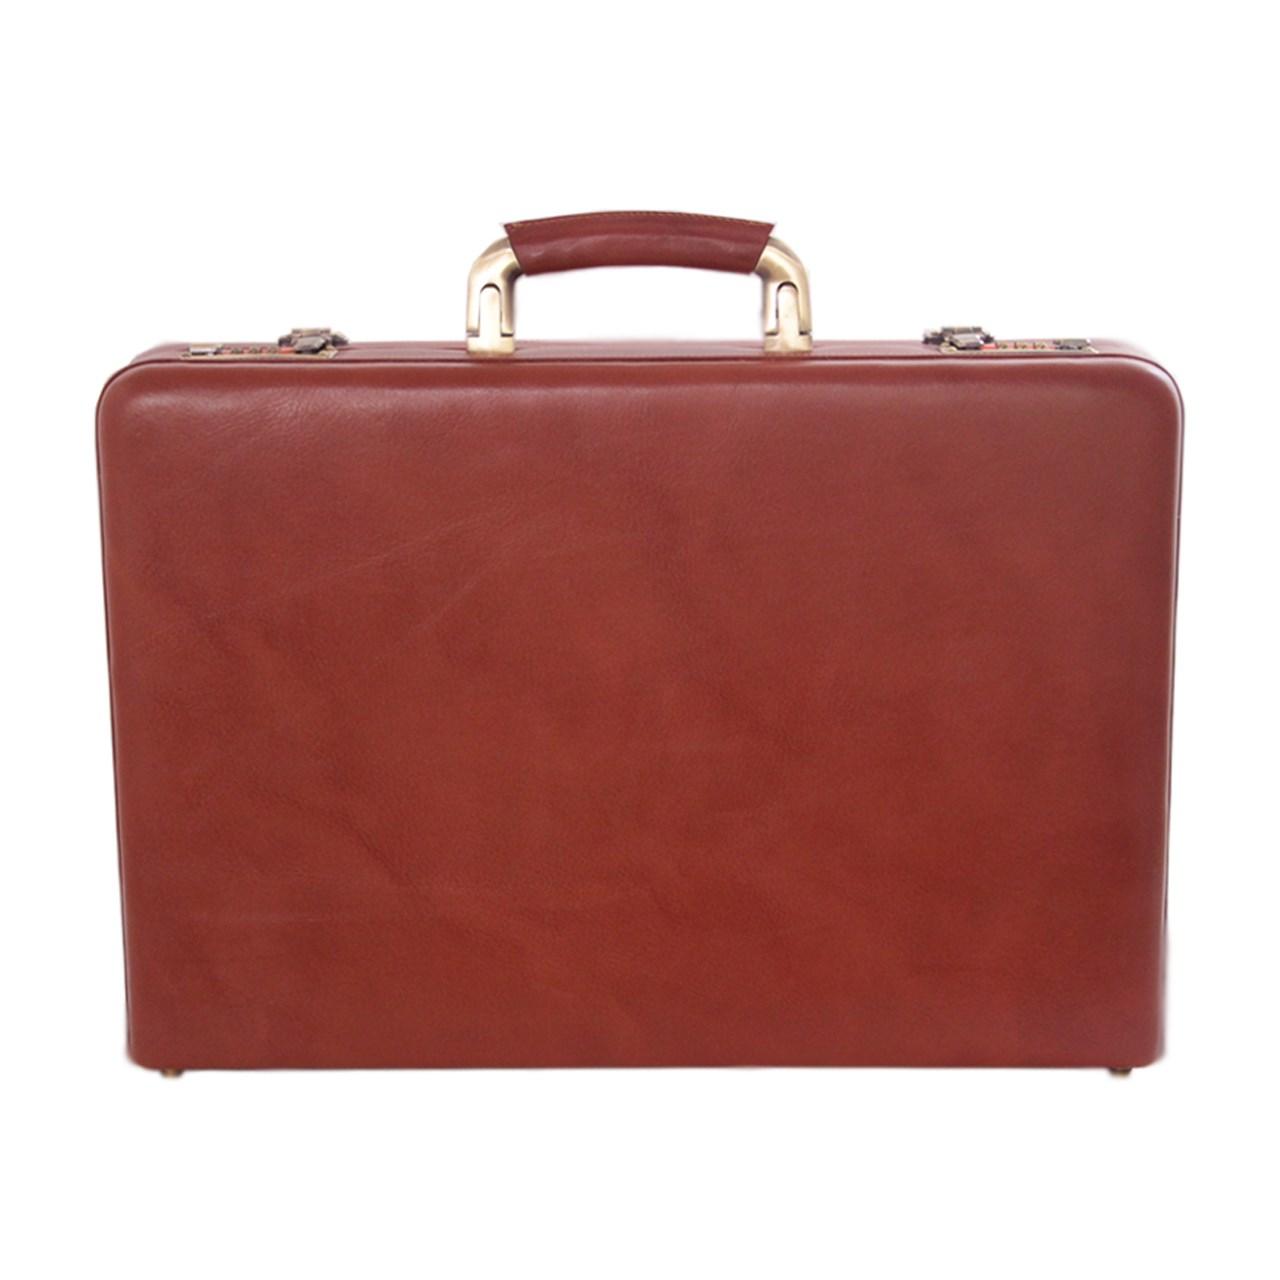 کیف اداری چرم طبیعی آدین چرم مدل DL22